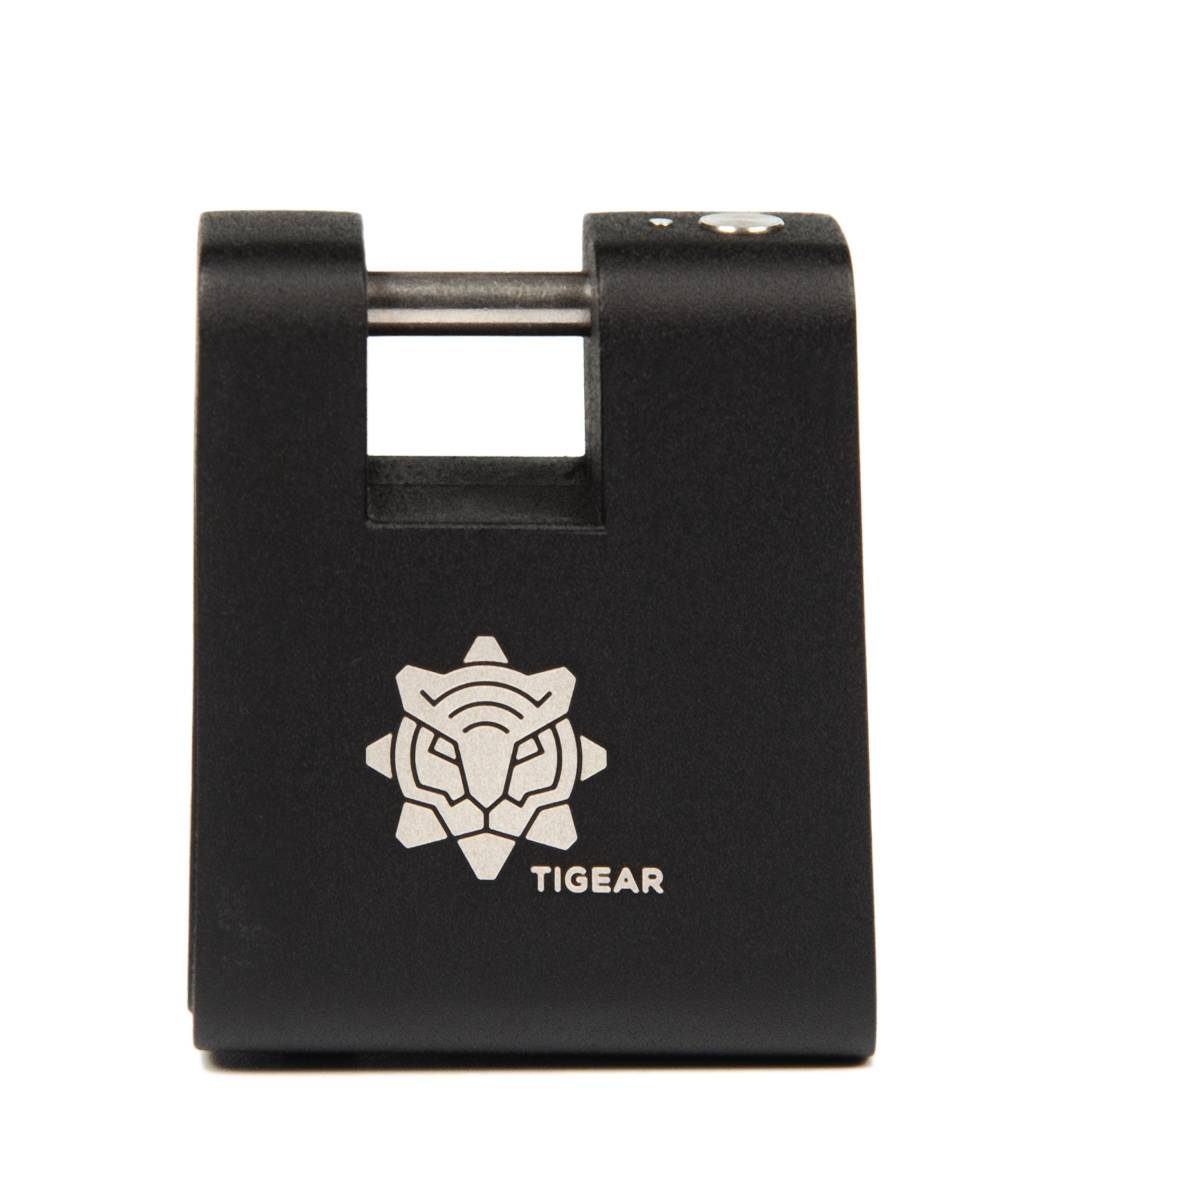 Биометрический замок для багажа со сканером отпечатка пальца Tigear Travel